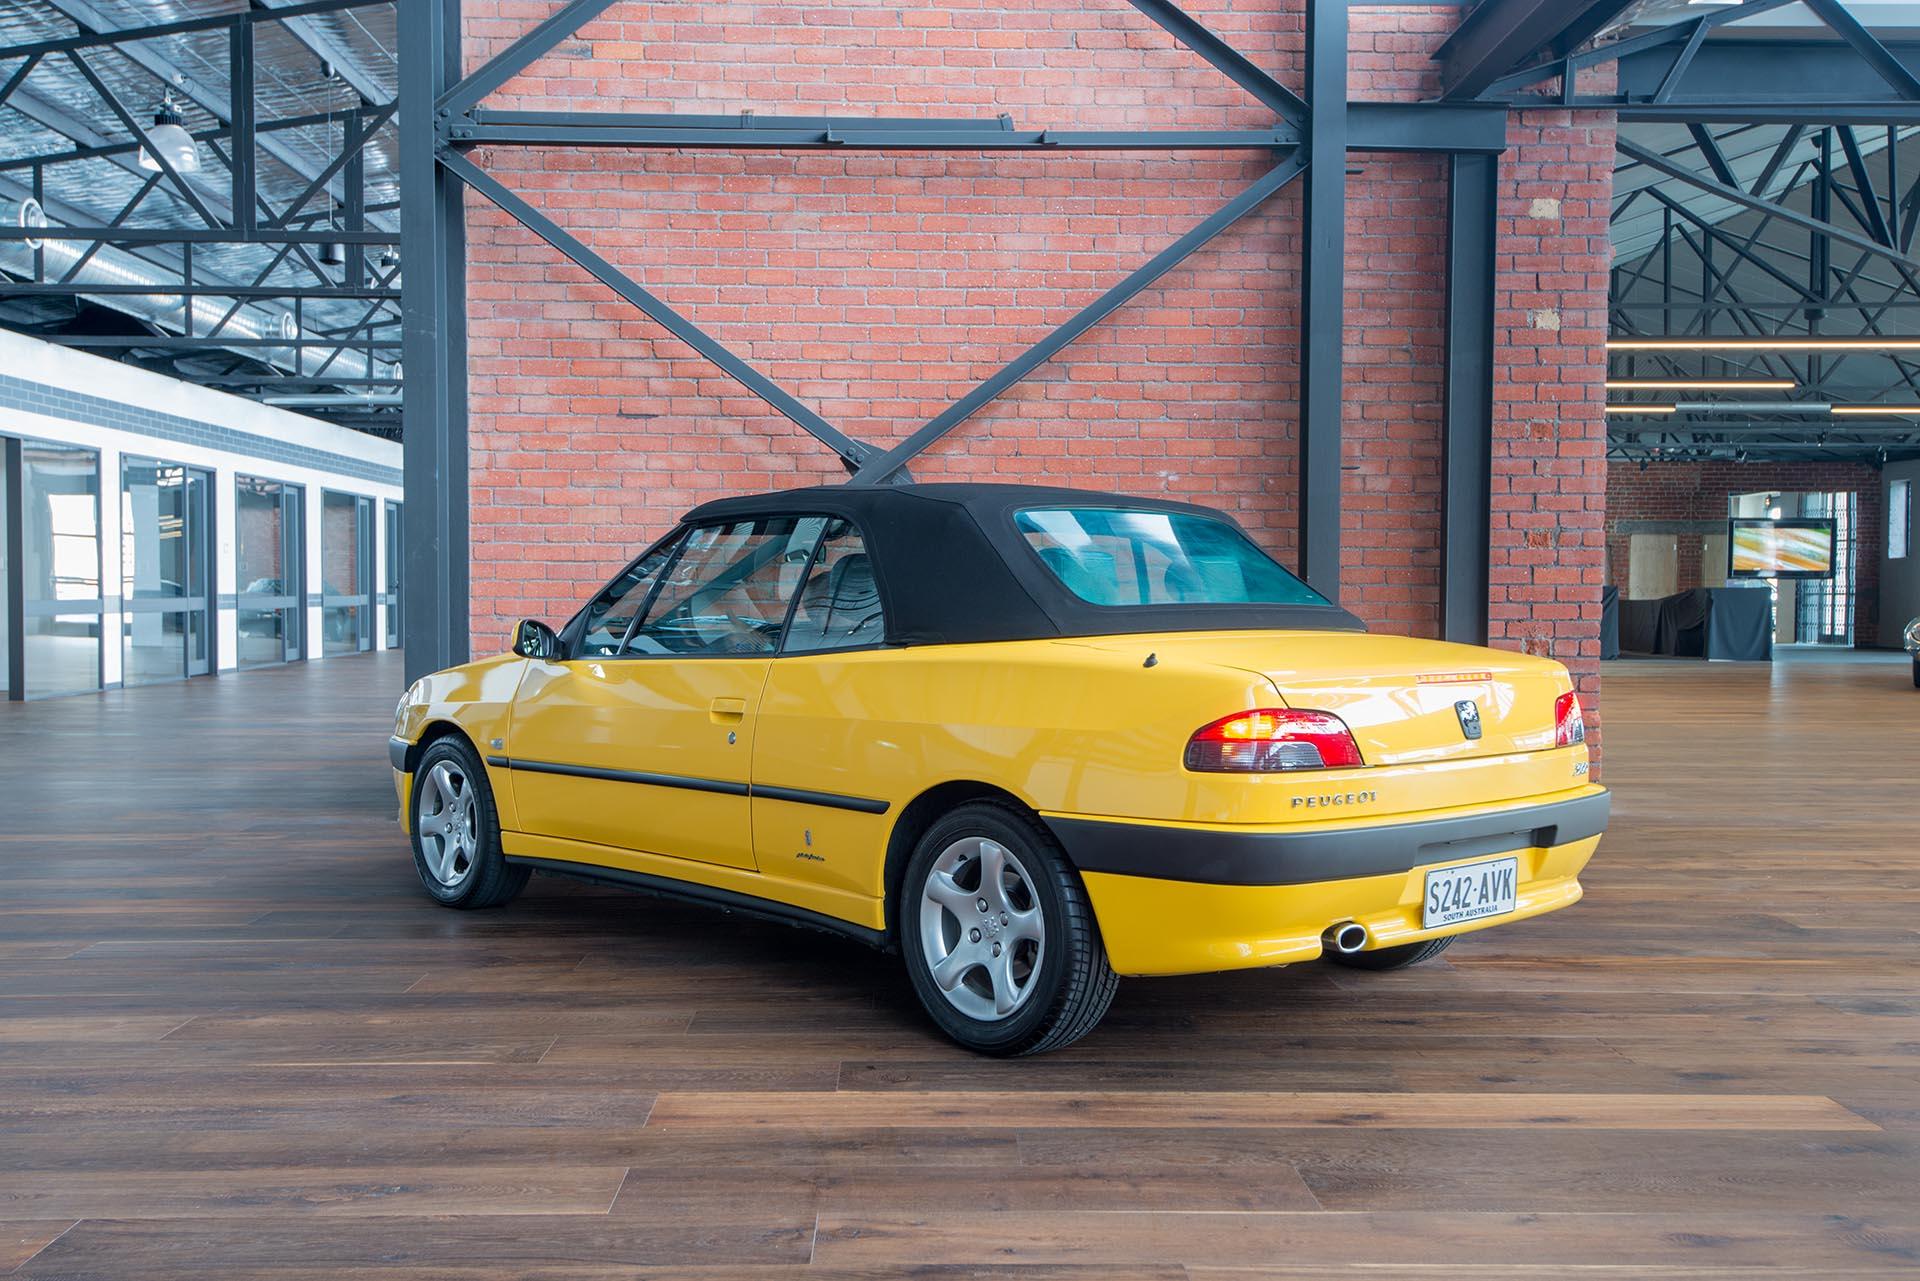 2001 peugeot 306 cabriolet for sale richmonds classic. Black Bedroom Furniture Sets. Home Design Ideas